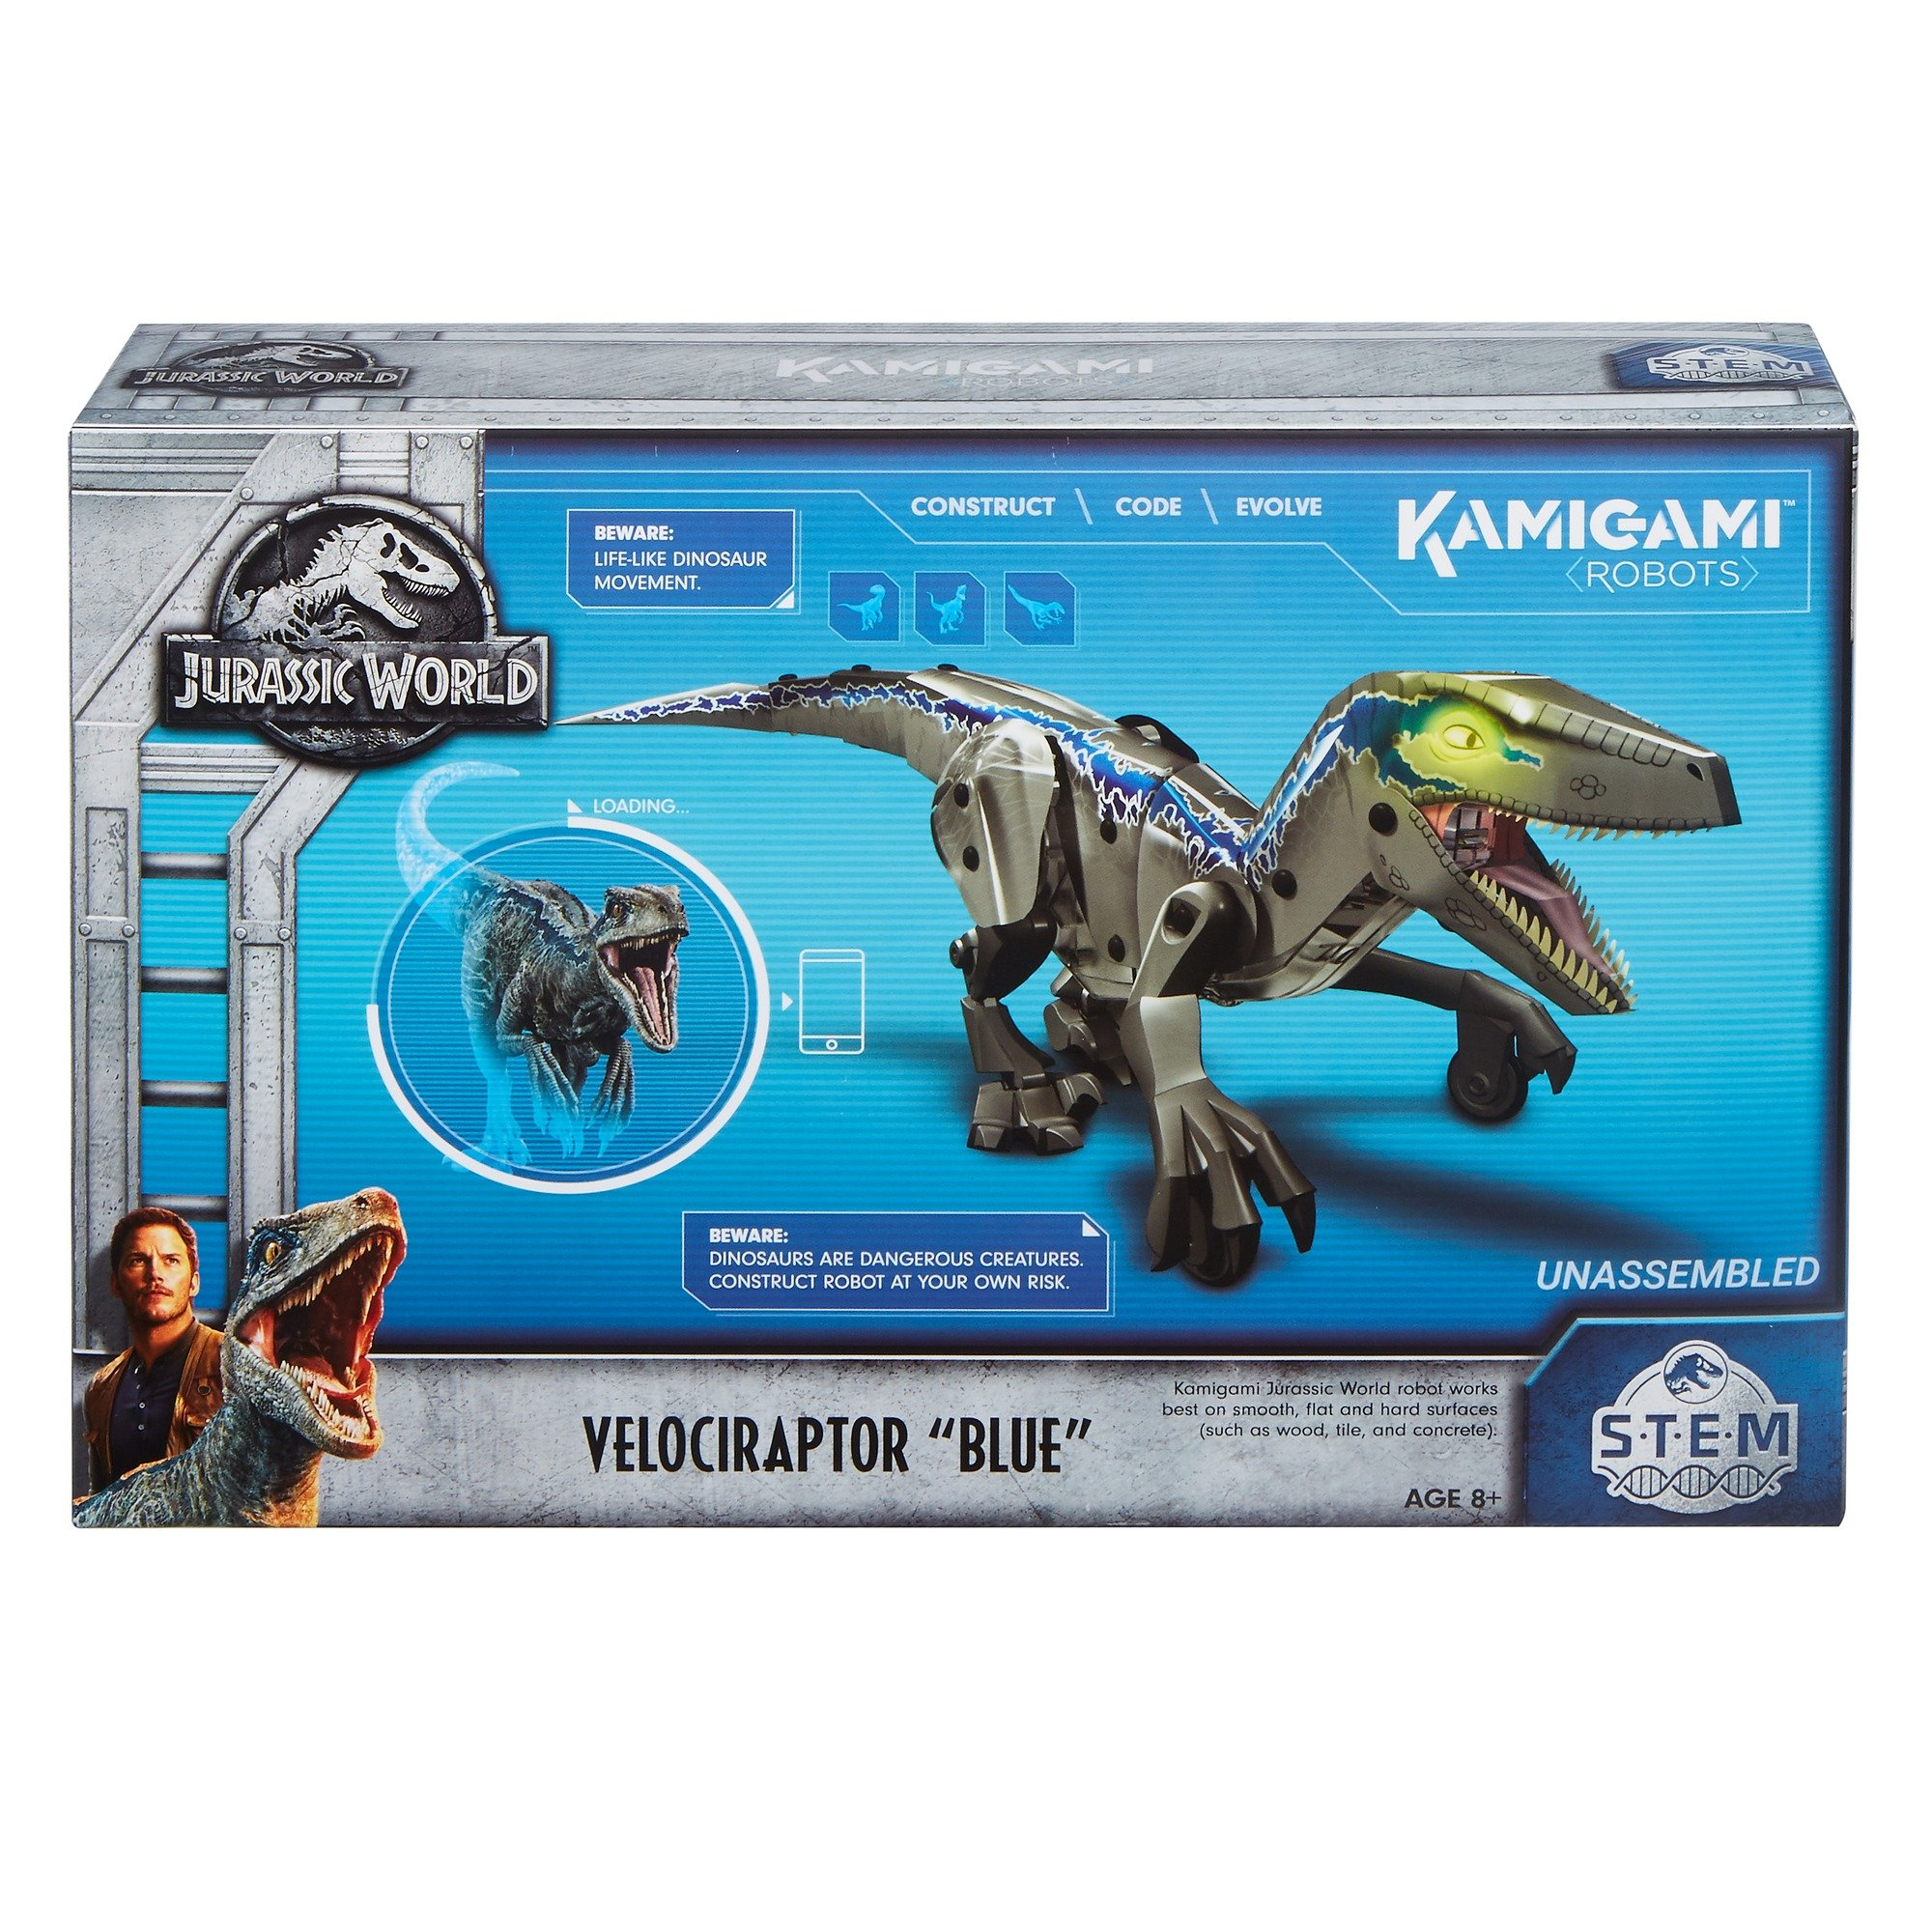 Kamigami Jurassic World Blue Robot by Jurassic World Toys (Image #15)